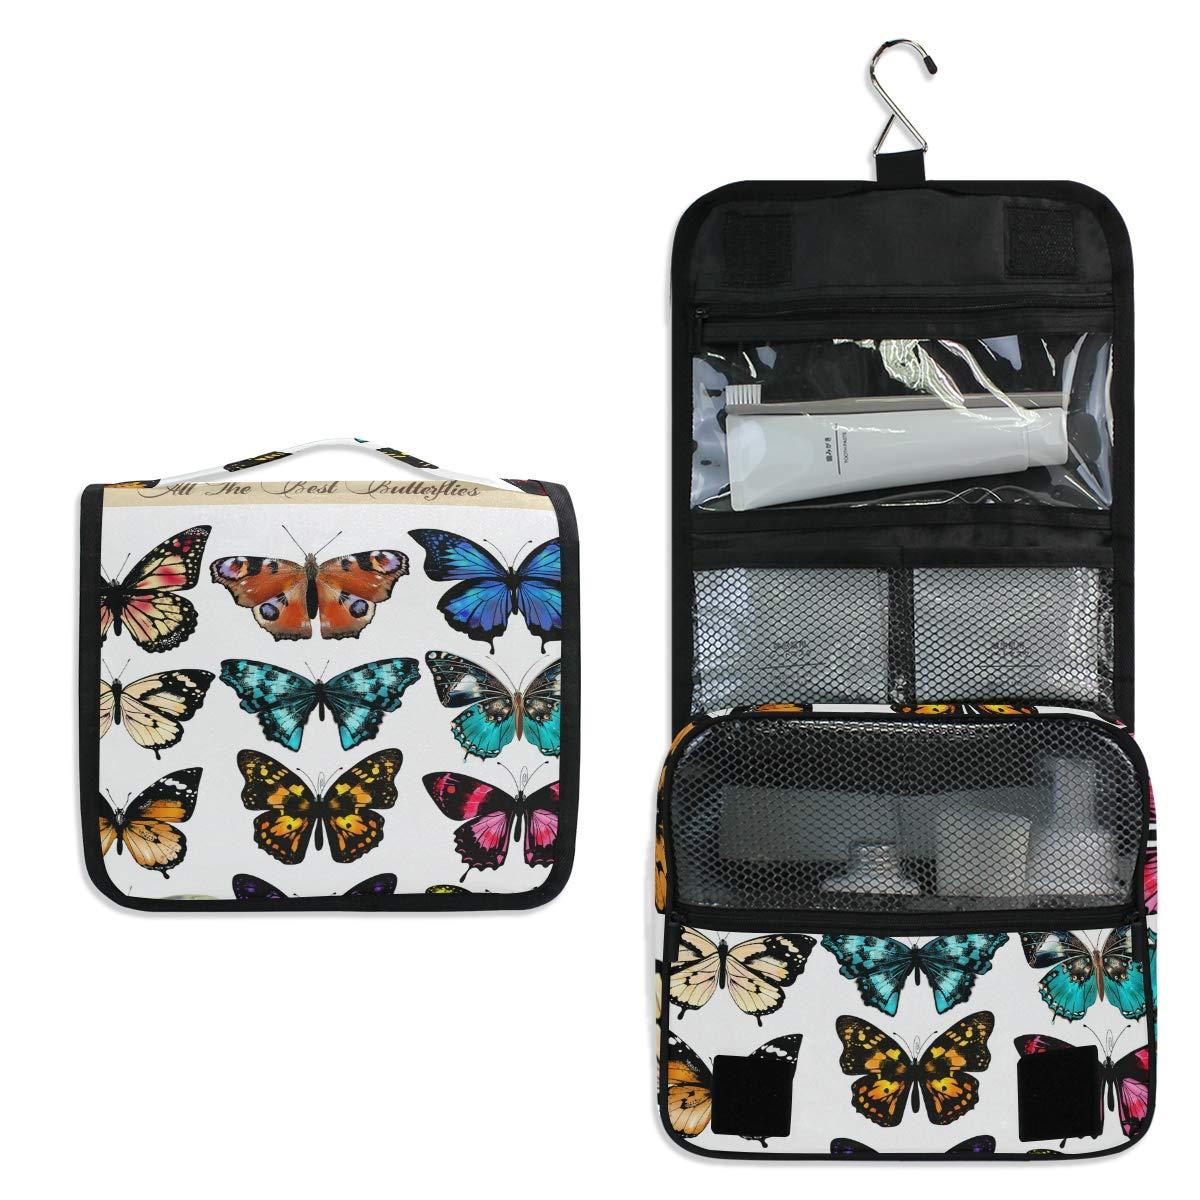 Toiletry Bag Travel Bag Hanging Hook - Coloured Butterflies Waterproof Cosmetic Bag Portable Makeup Pouch for Girls Men Women